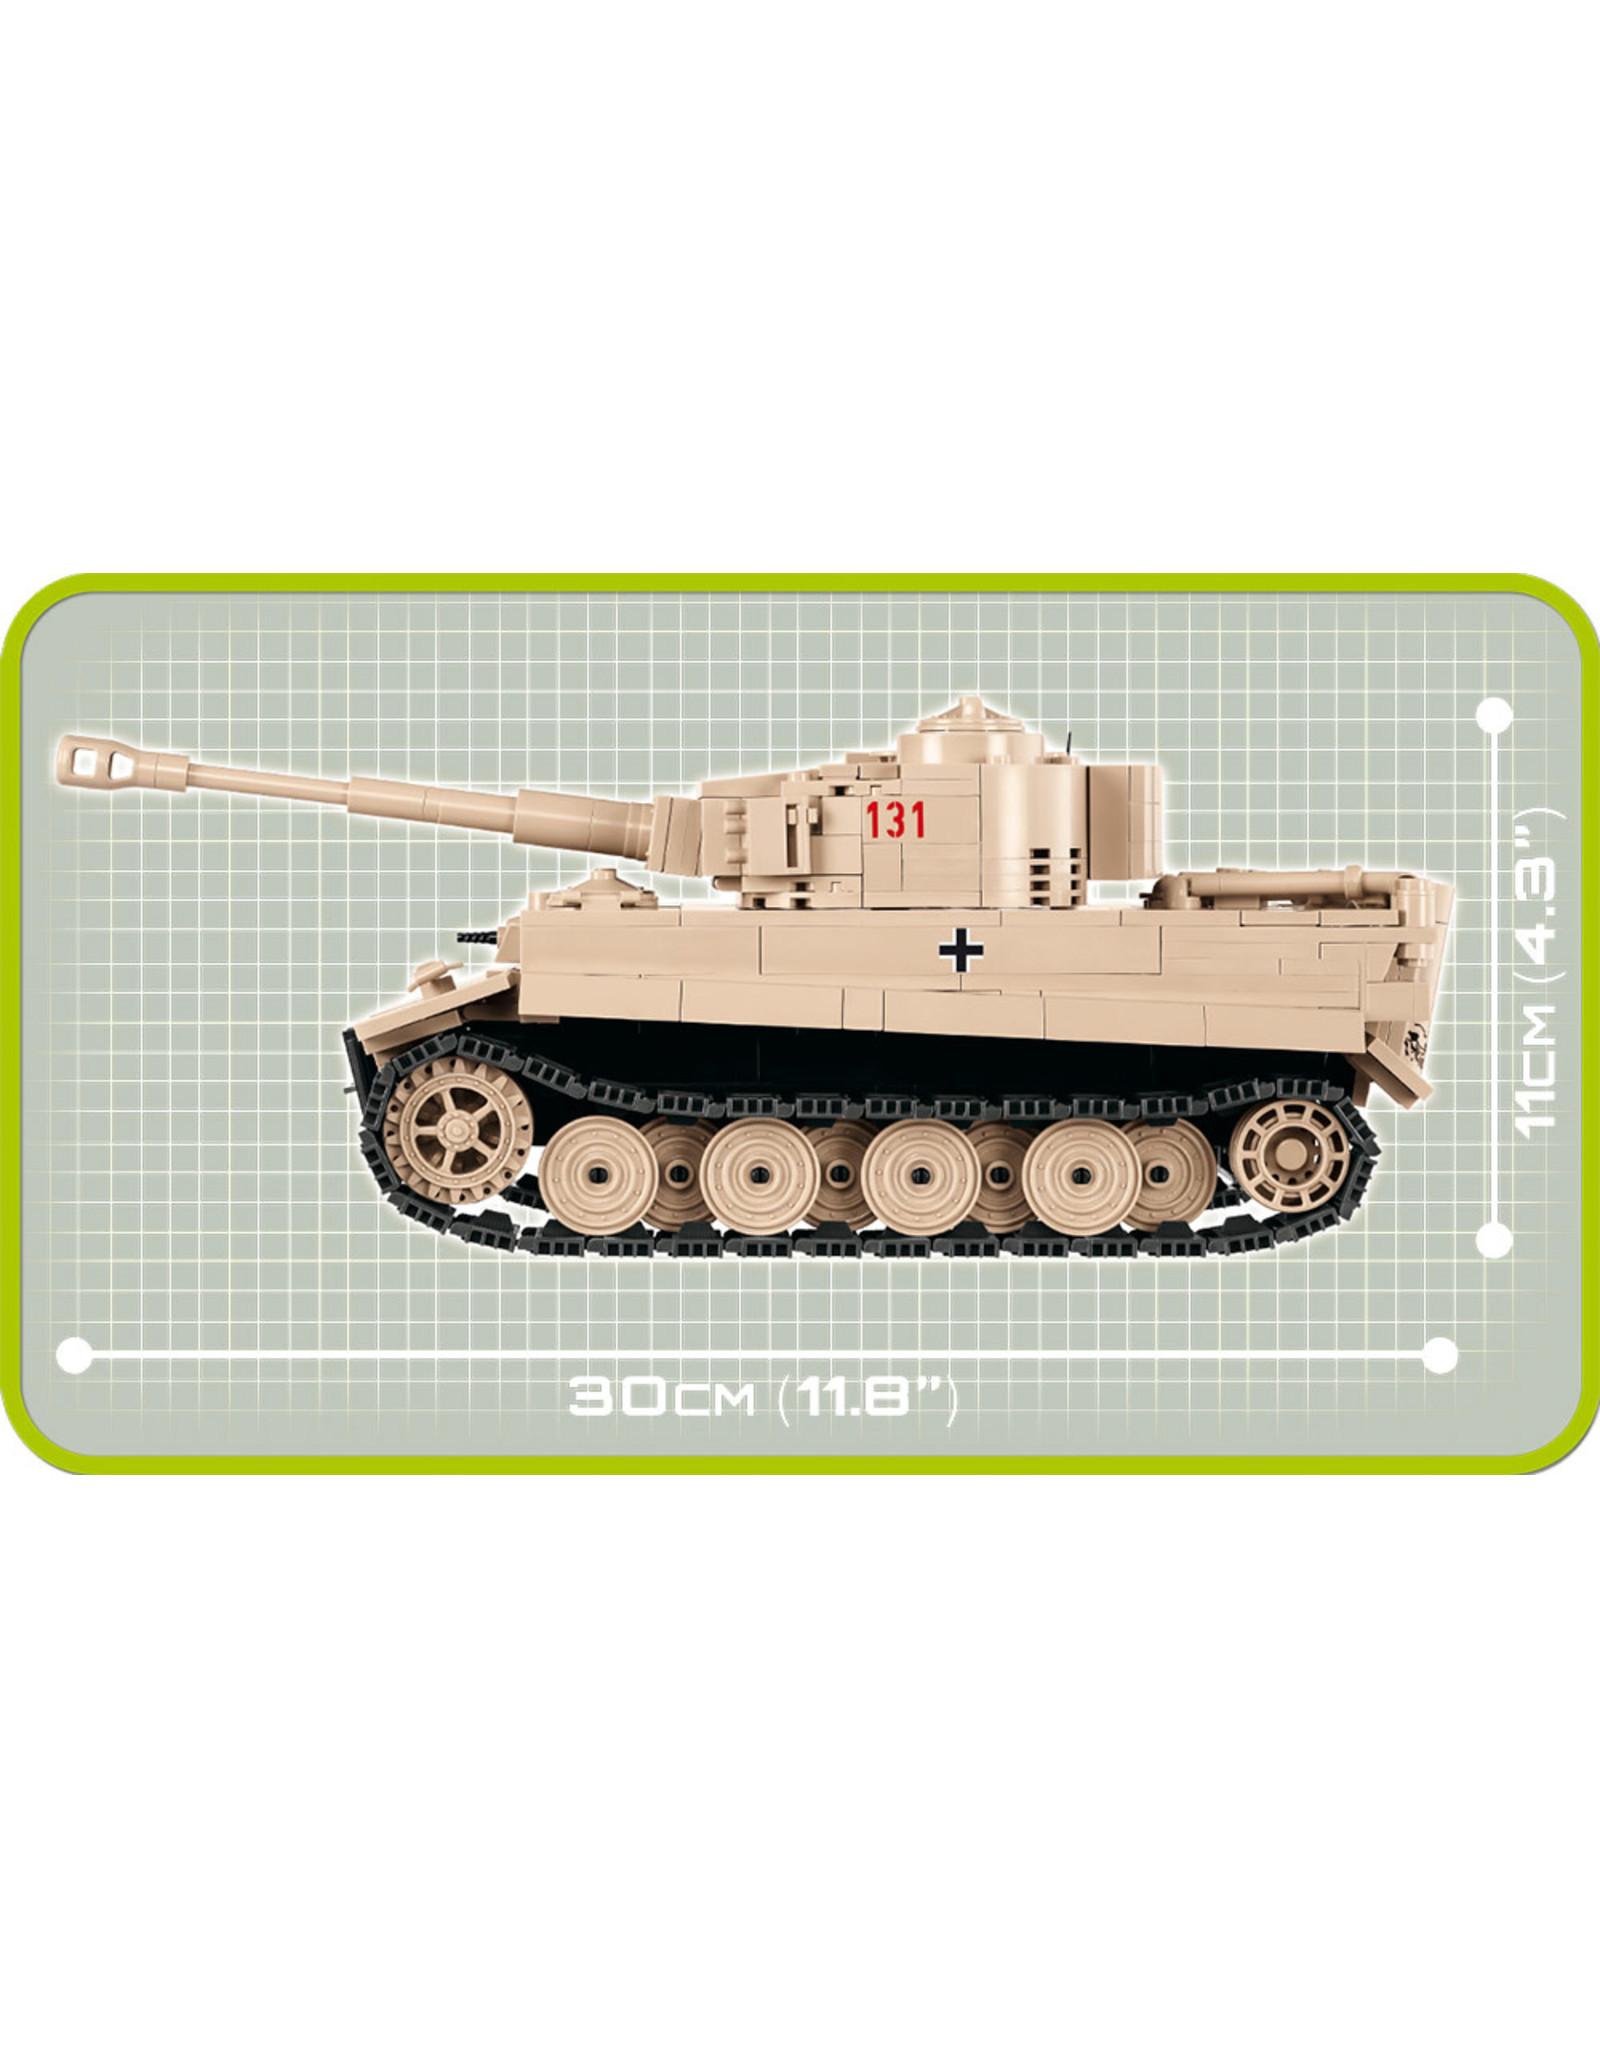 COBI COBI WW2 2519 - Tiger 131 SD.KFZ.181 Panzerkampfwagen VI